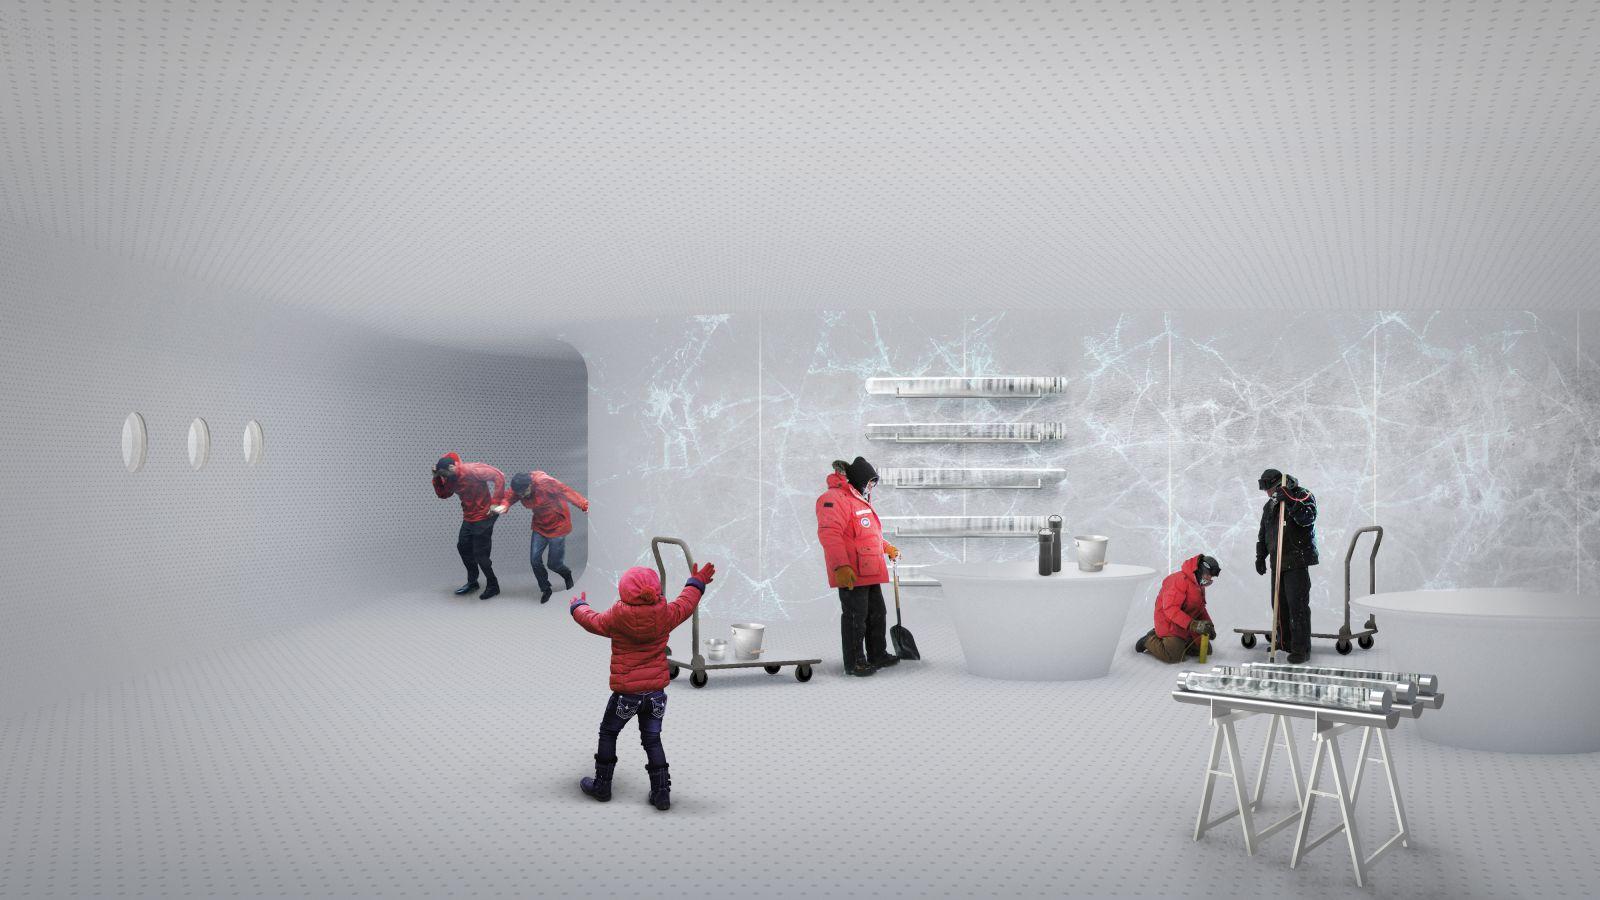 International Antartic Center